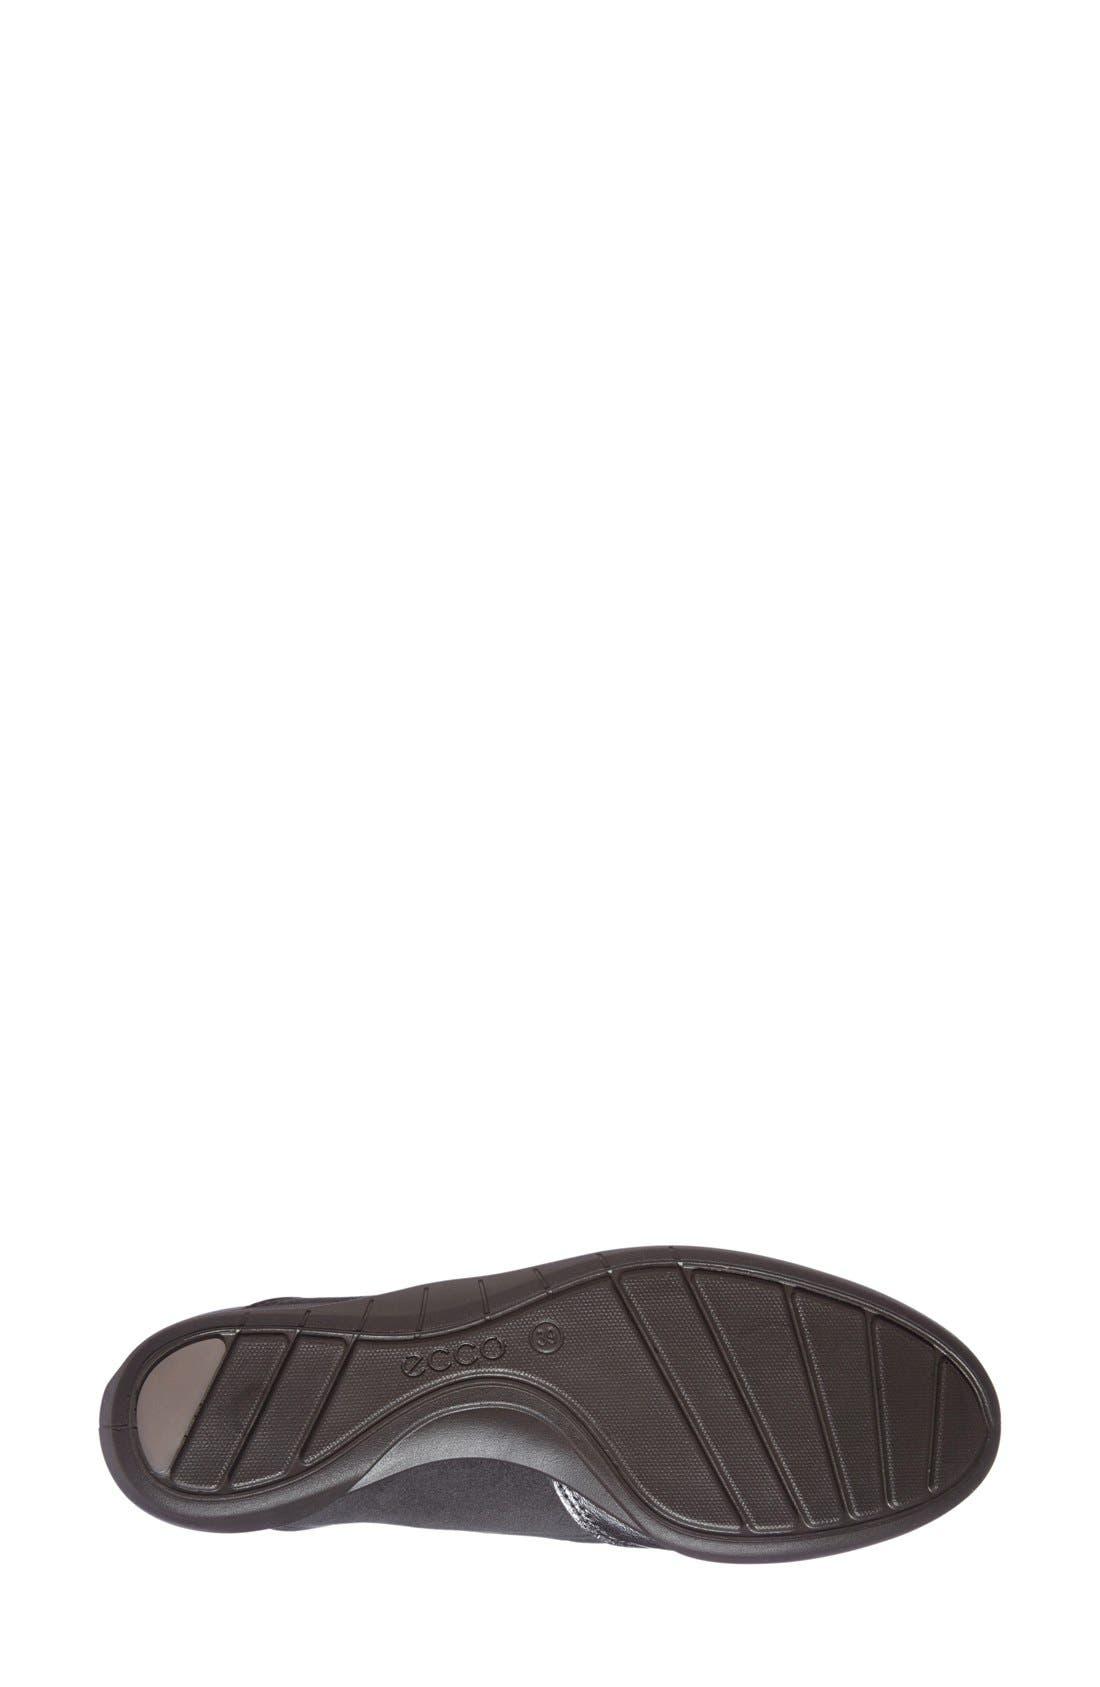 'Bluma' Sneaker,                             Alternate thumbnail 9, color,